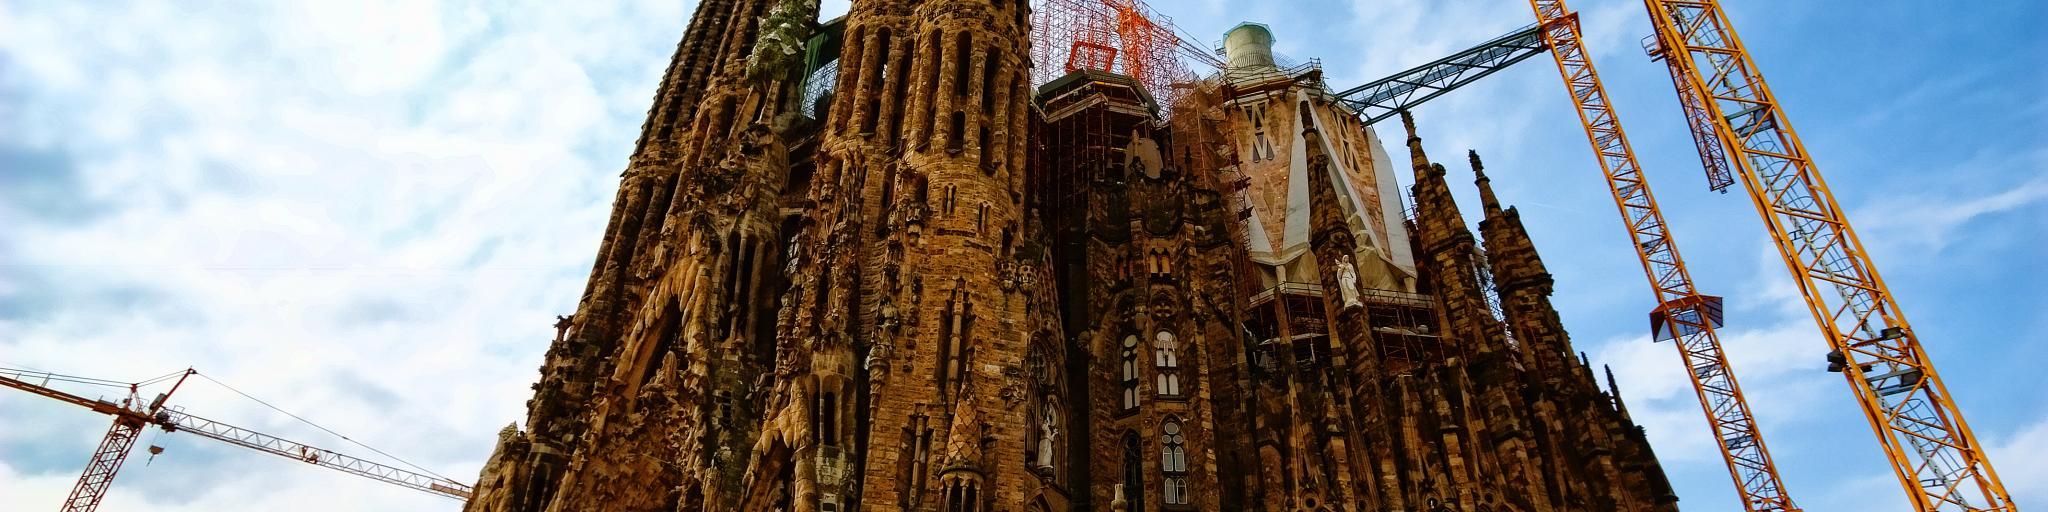 Cranes surround the towers of the unfinished La Sagrada Familia church in Barcelona, designed by Gaudi